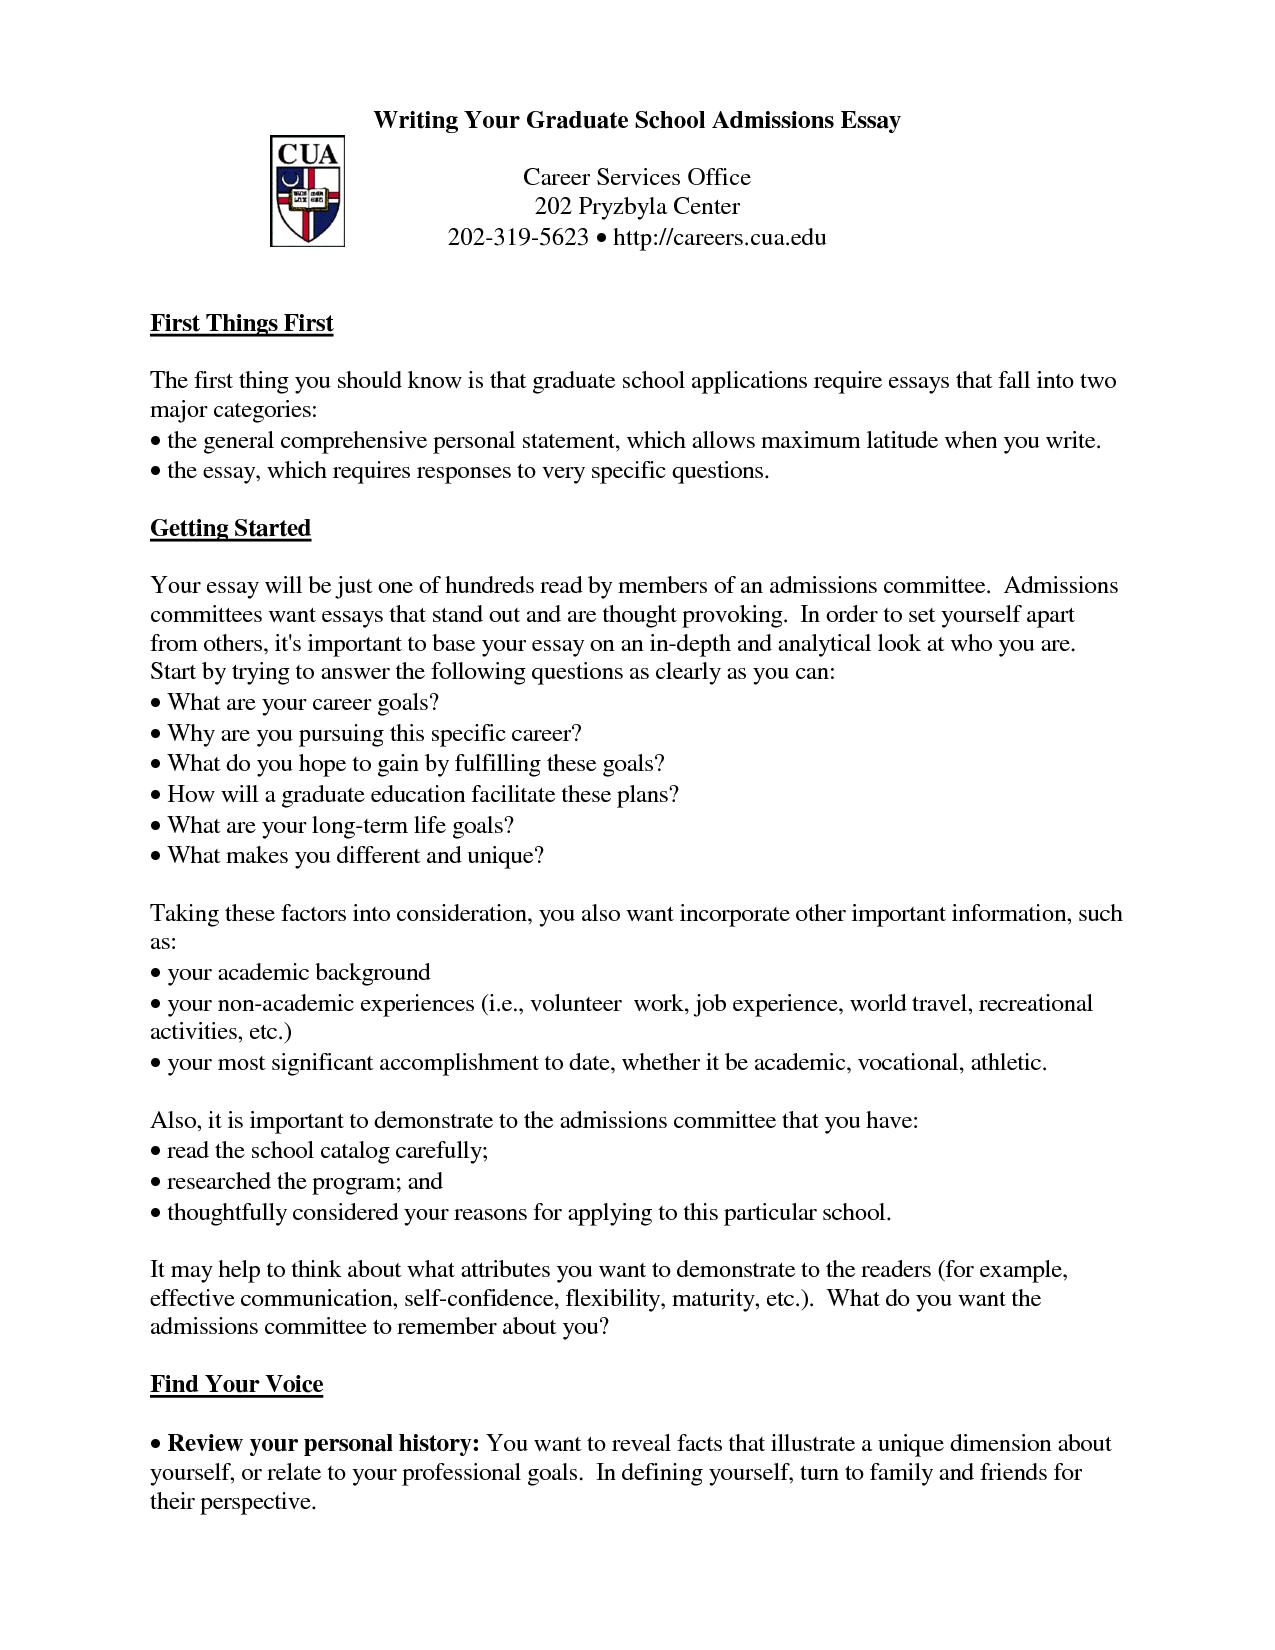 003 Essay For Master Degree Application Example Rare Pdf Sample Full